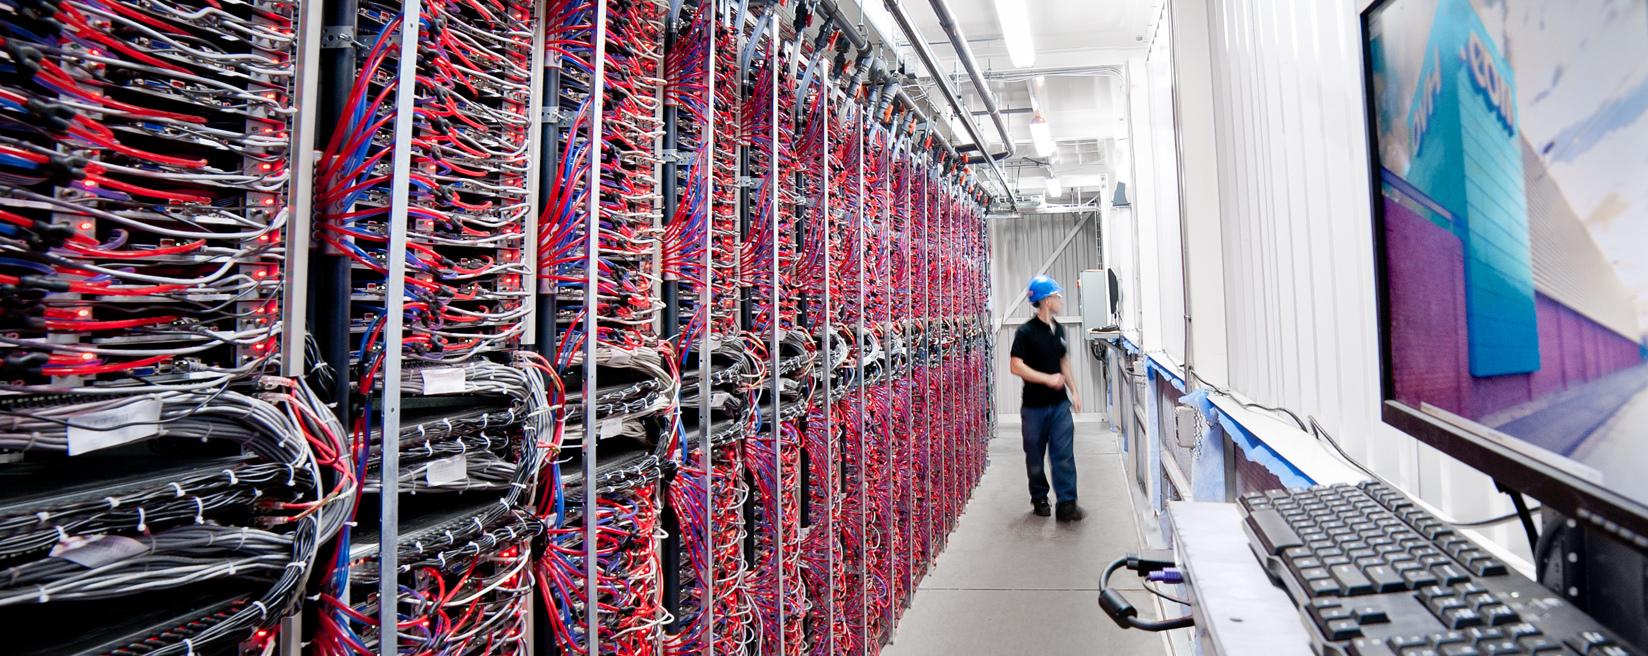 ovh_datacenter1-300x300_vyrez